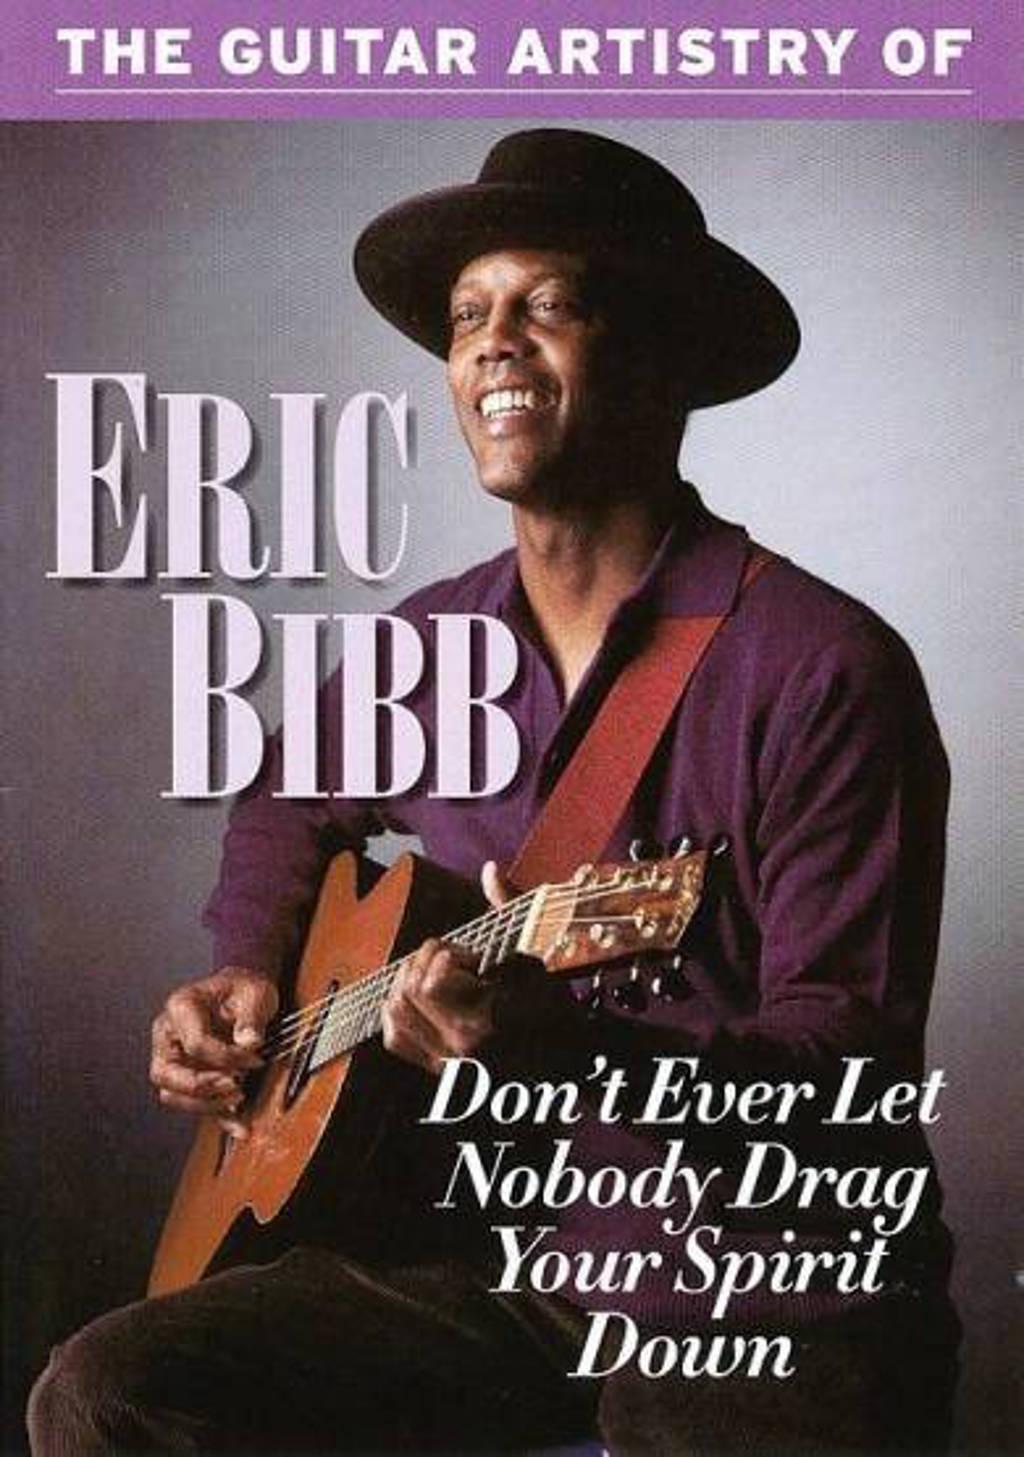 Eric Bibb - Don't Ever Let Nobody Drag Your Spi (DVD)